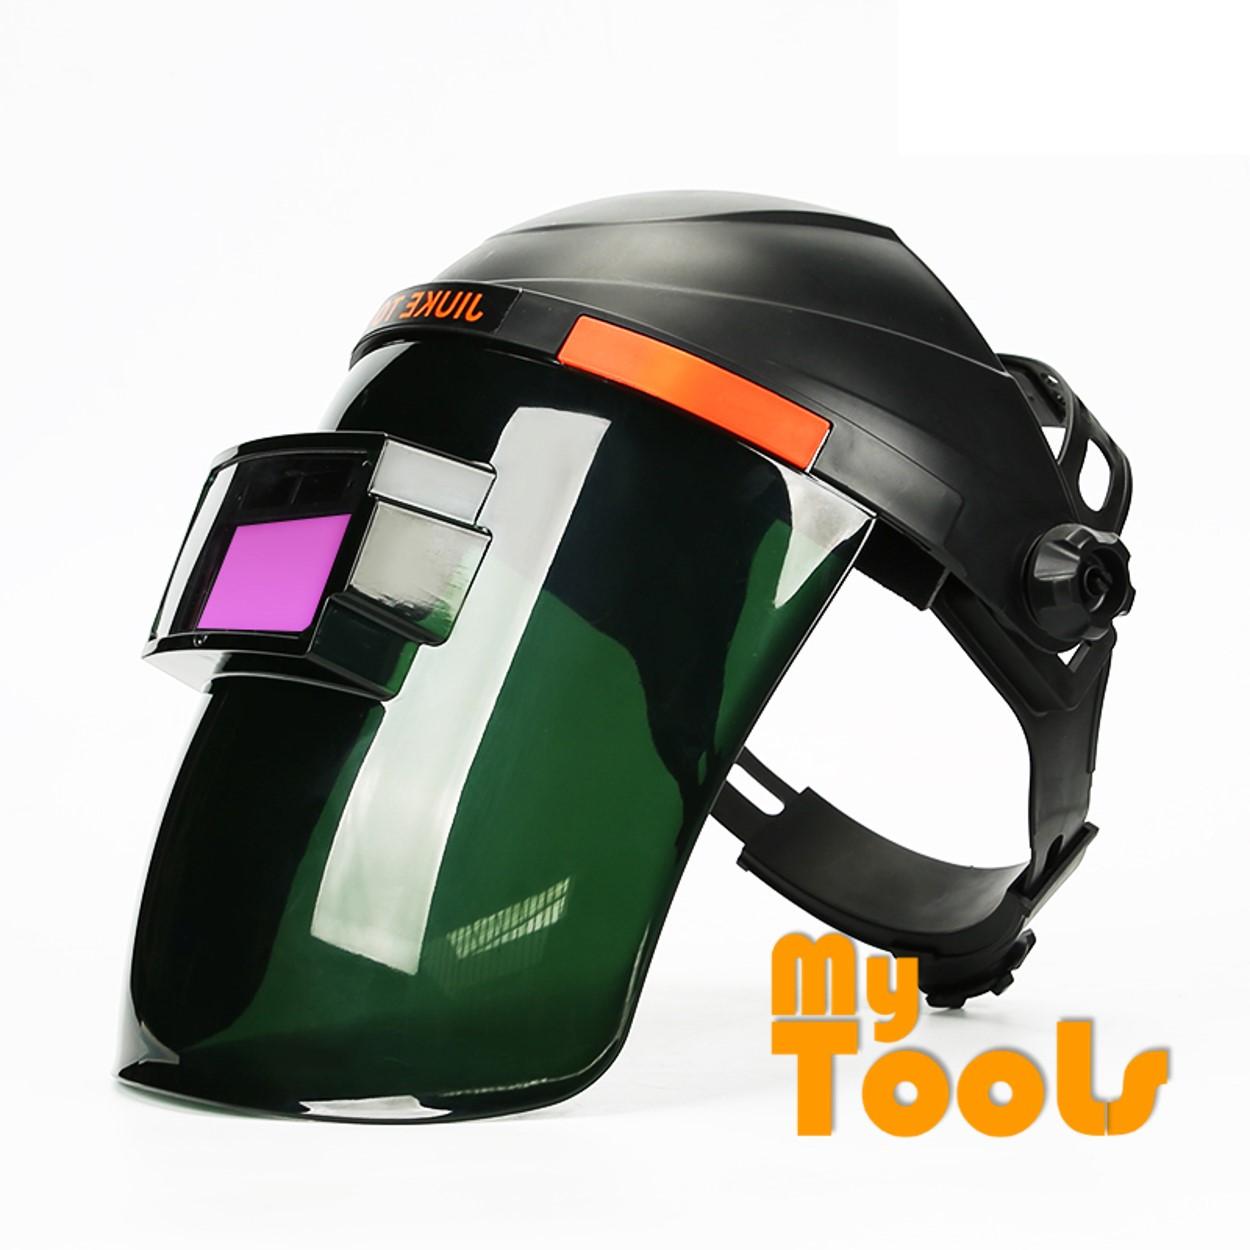 Mytools Auto-Darkening Solar Welding Helmet Mask with 4 Independent Shade Filter Sensors, Welding Mask